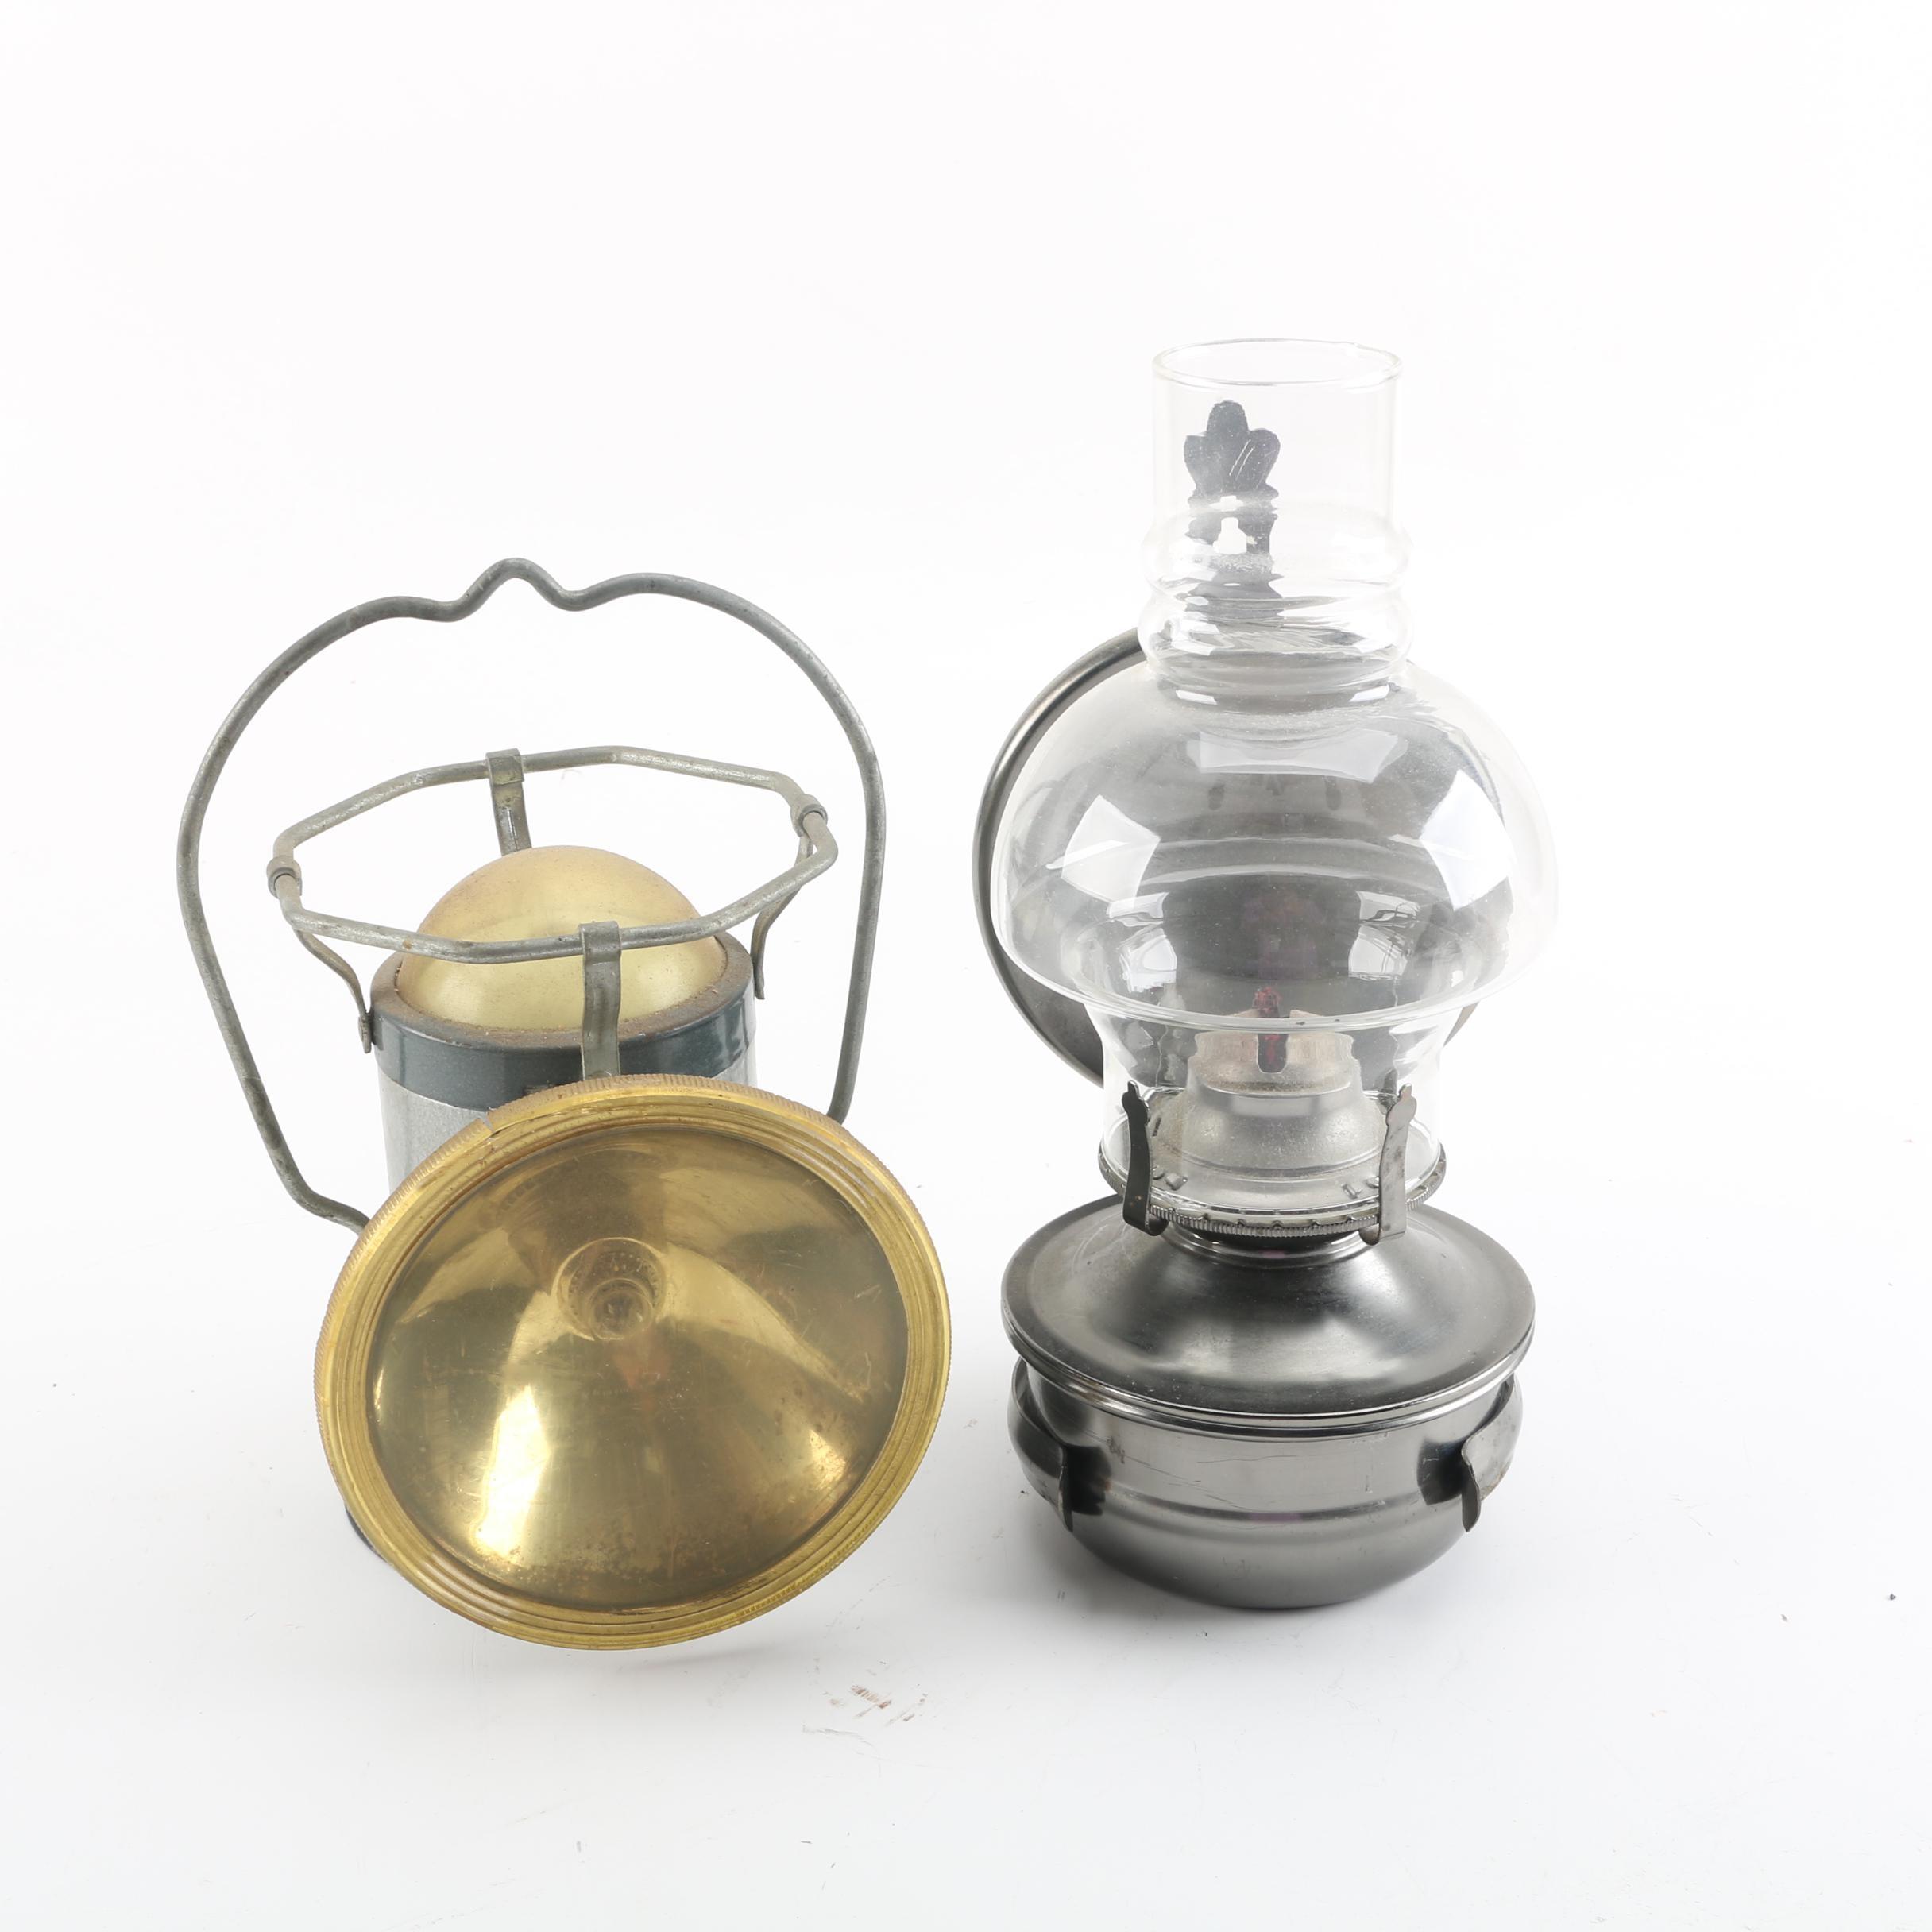 Delta PowerLite Battery Lantern and Kerosene Lantern